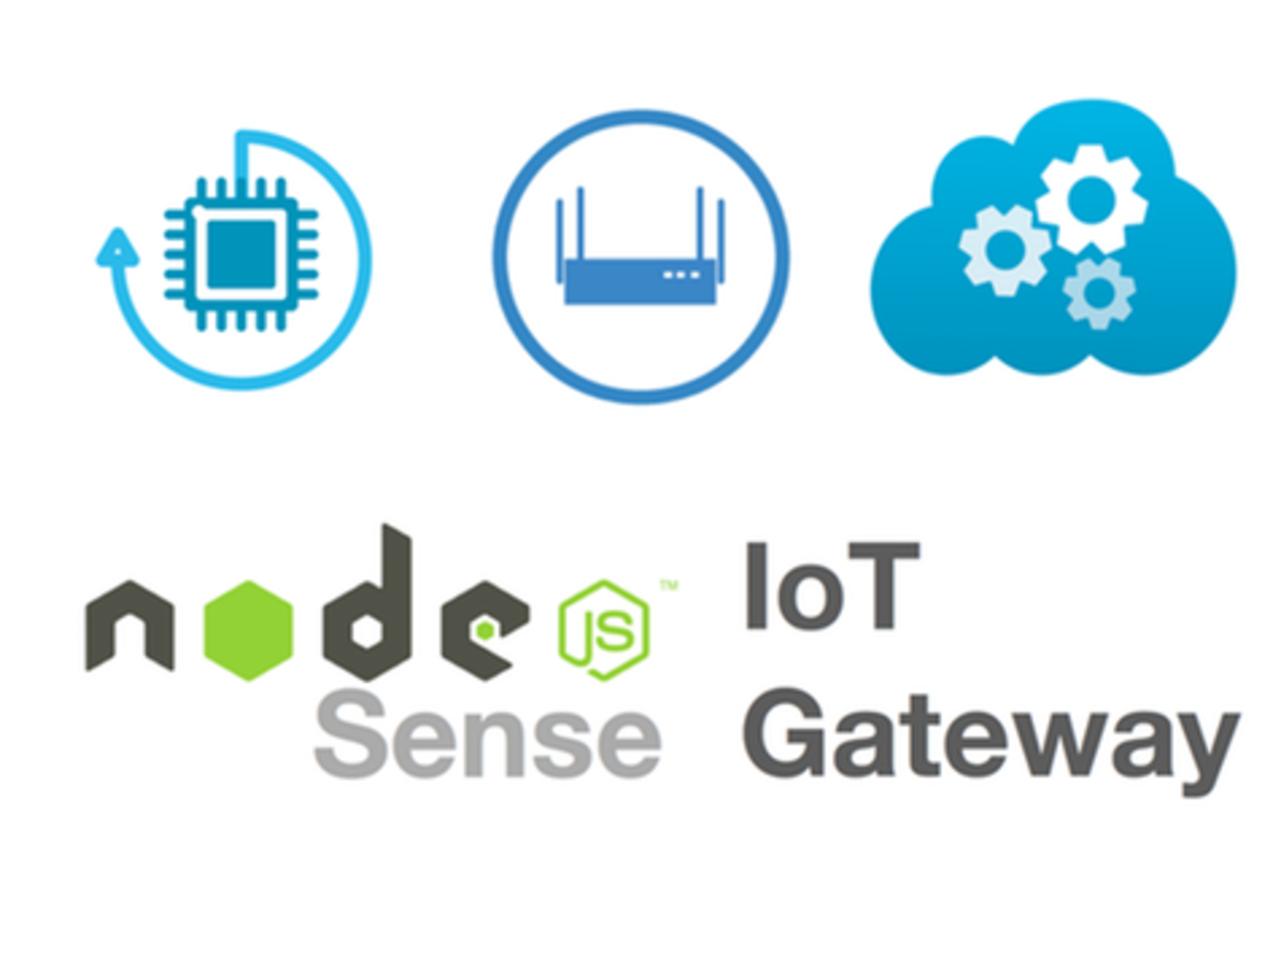 NodeSense Gateway